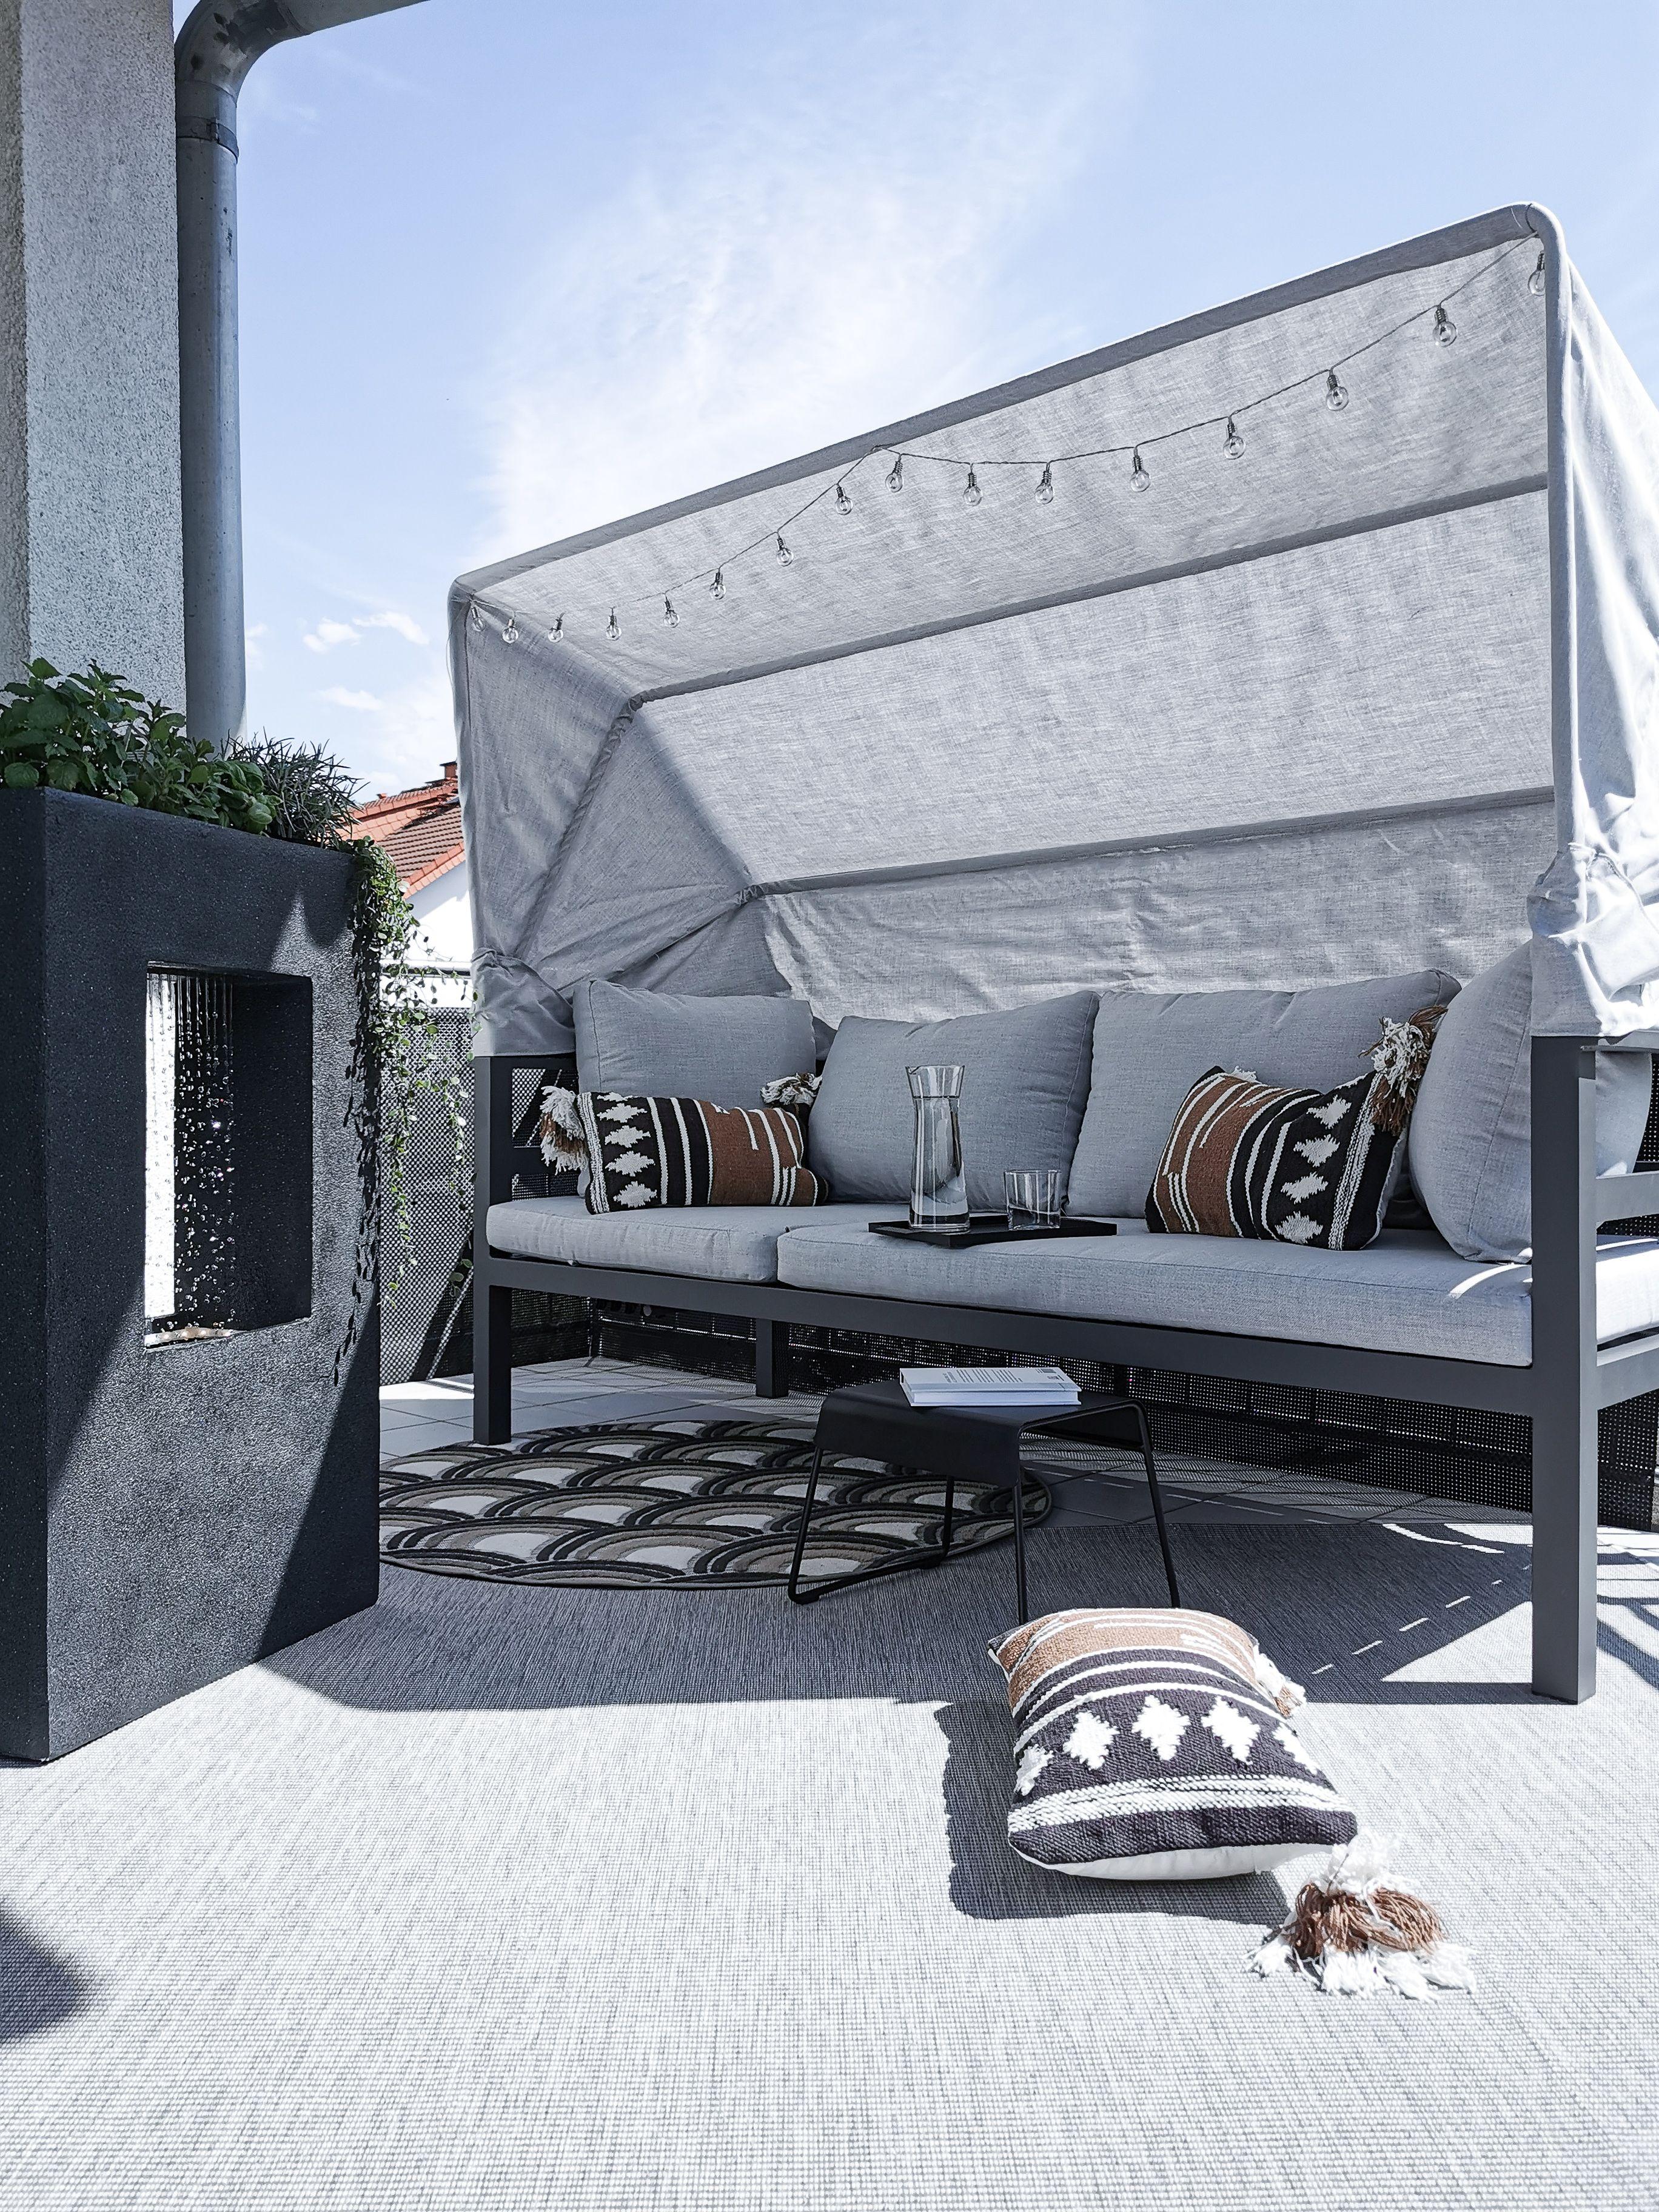 Ideen Fur Den Abenteuerspielplatz Zuhause Ig Liep Ert To The Moon Depot Outdoor Sofa Tipi Zelt Zimmergestaltung